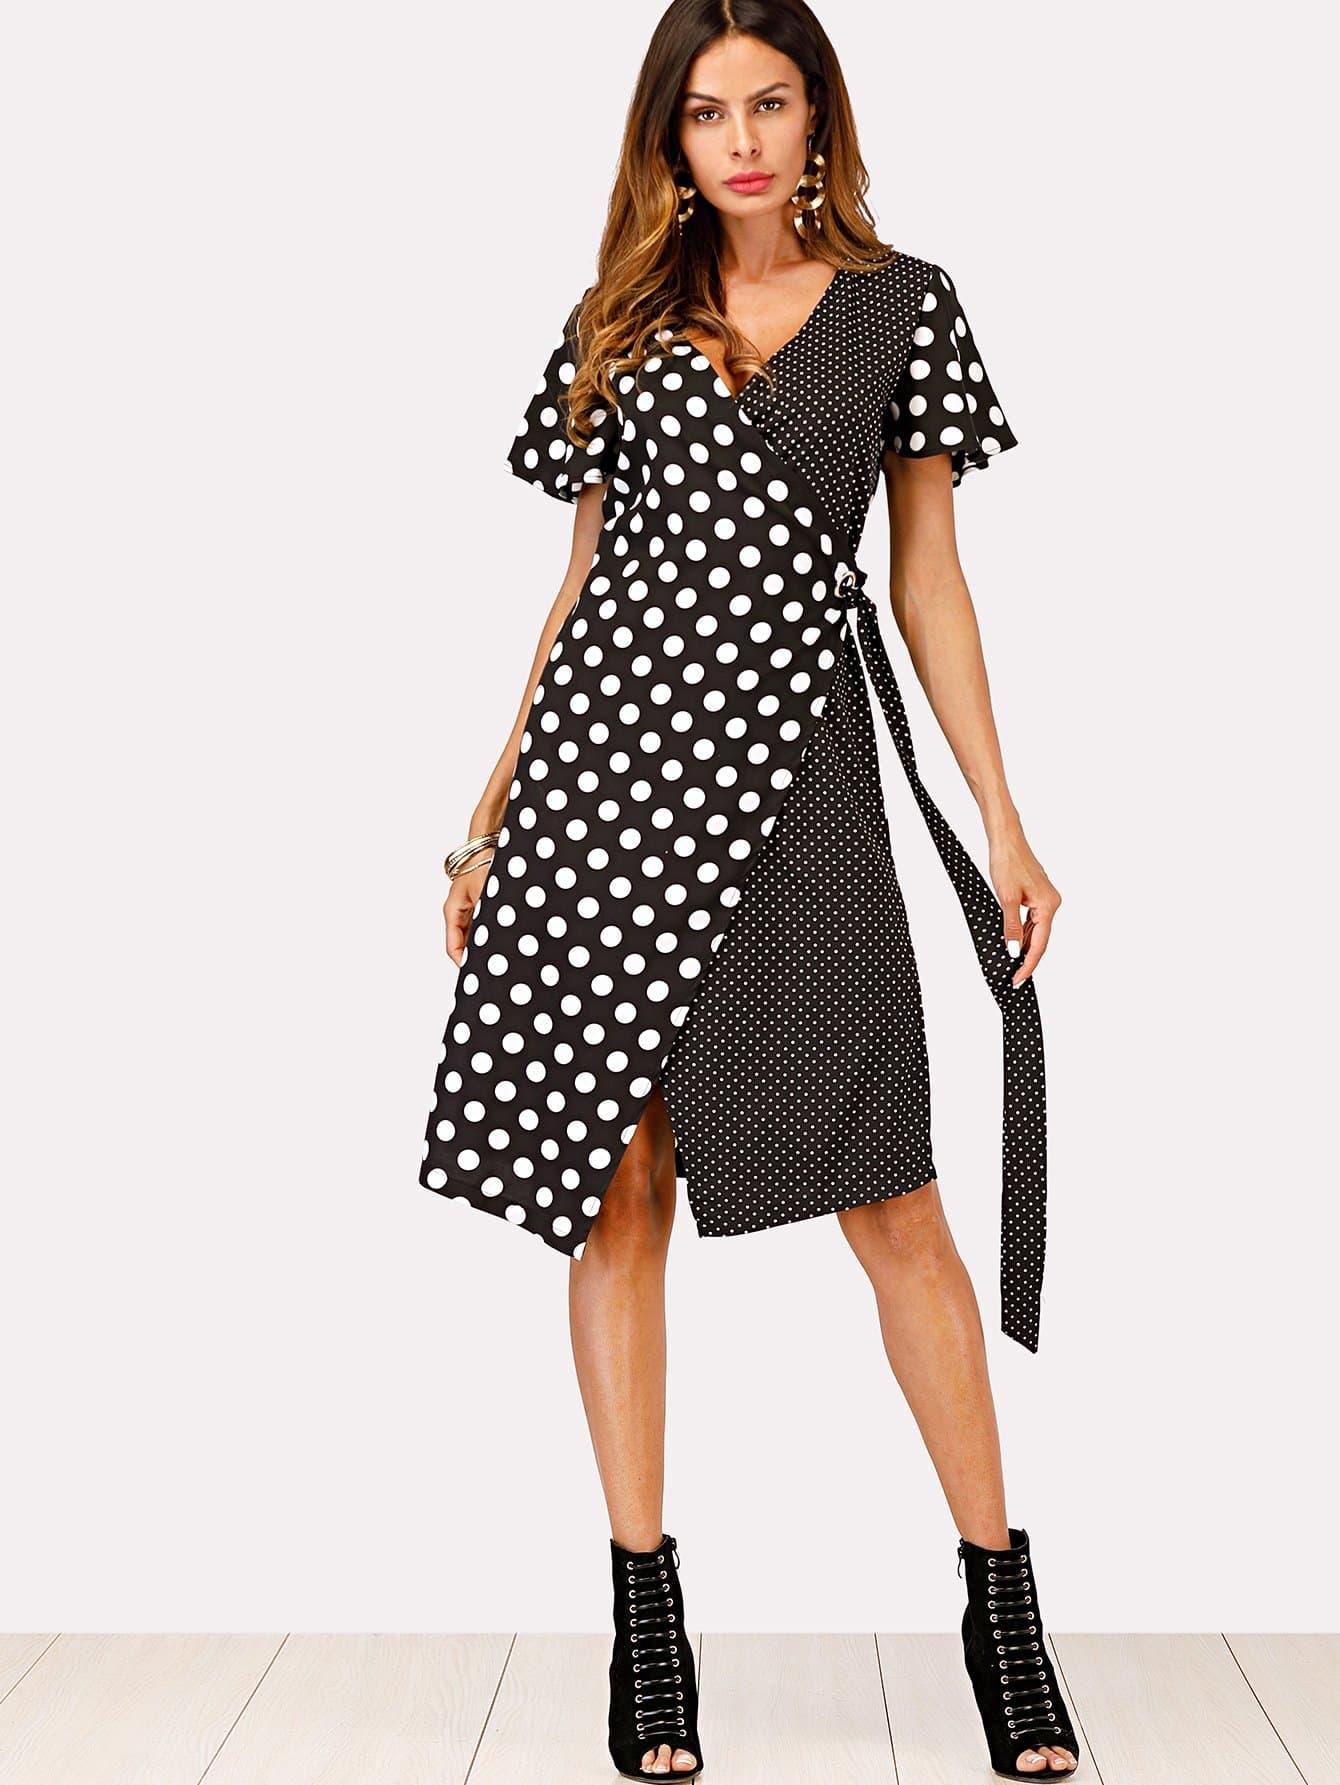 Contrast Polka Dot Knot Side Dress guitar print knot side dress